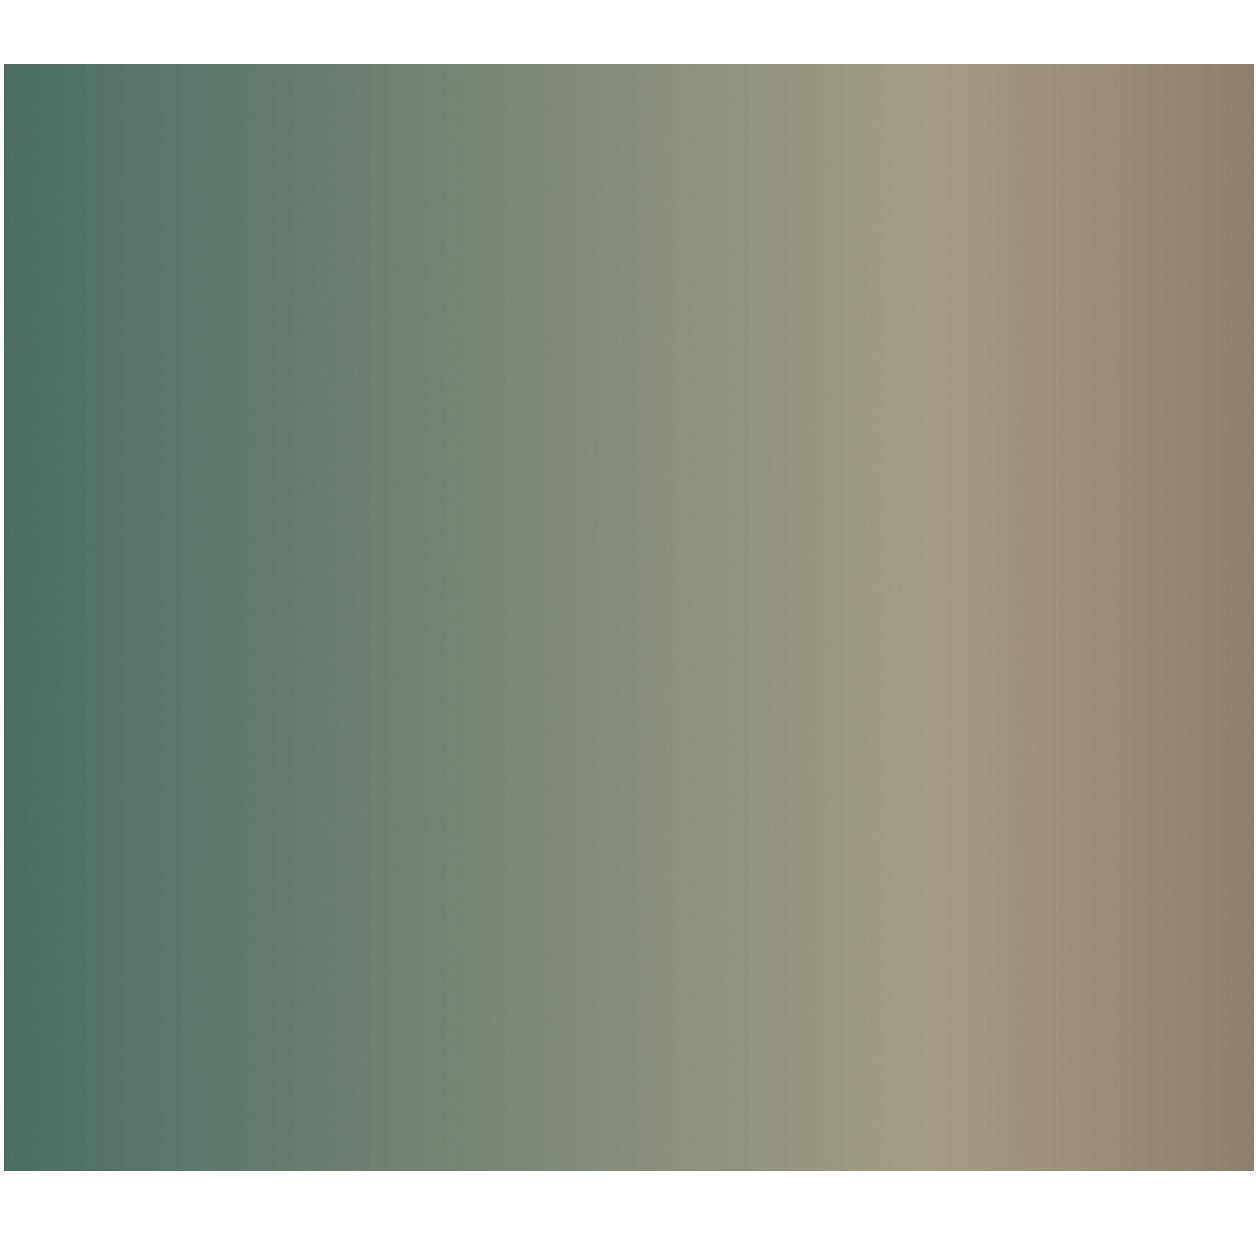 Geometry-3-gradient